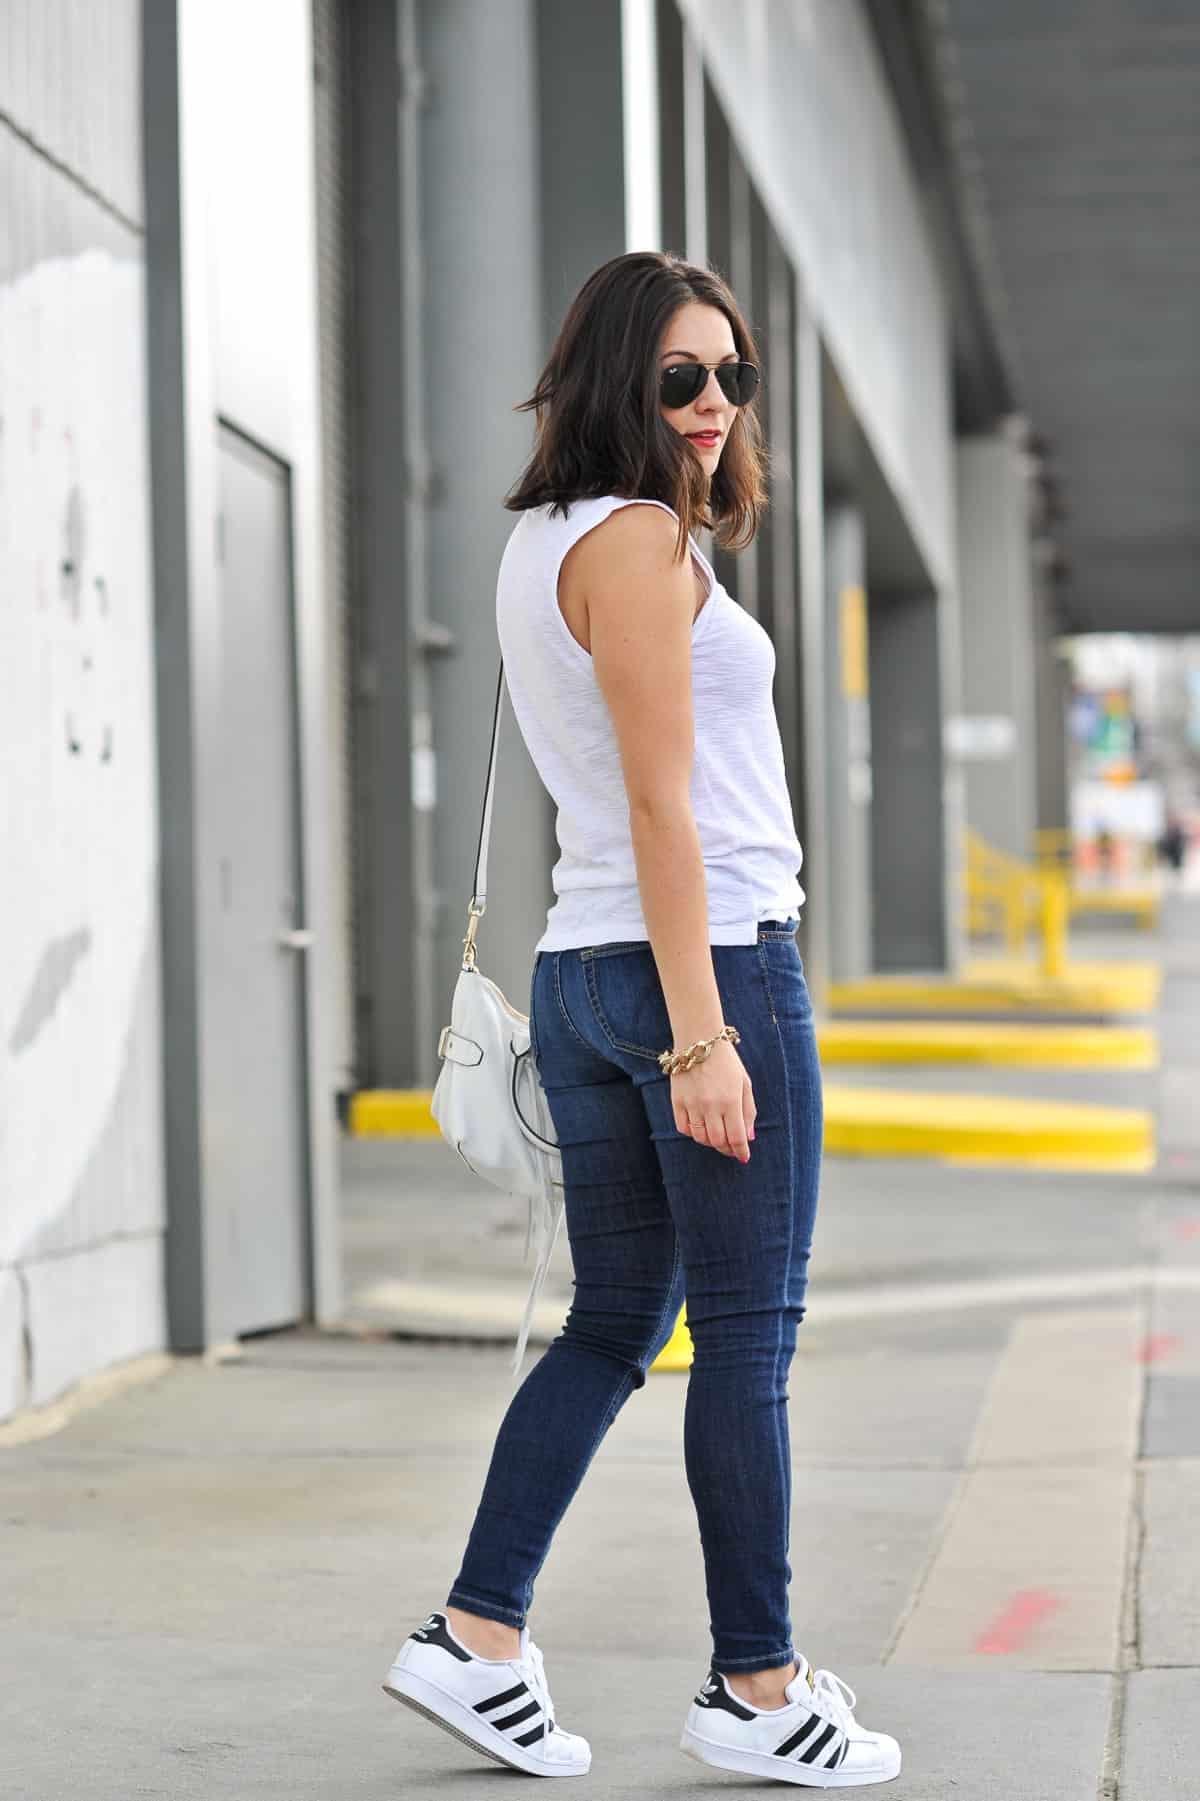 adidas originals, street style, My Style Vita - @mystylevita - 17